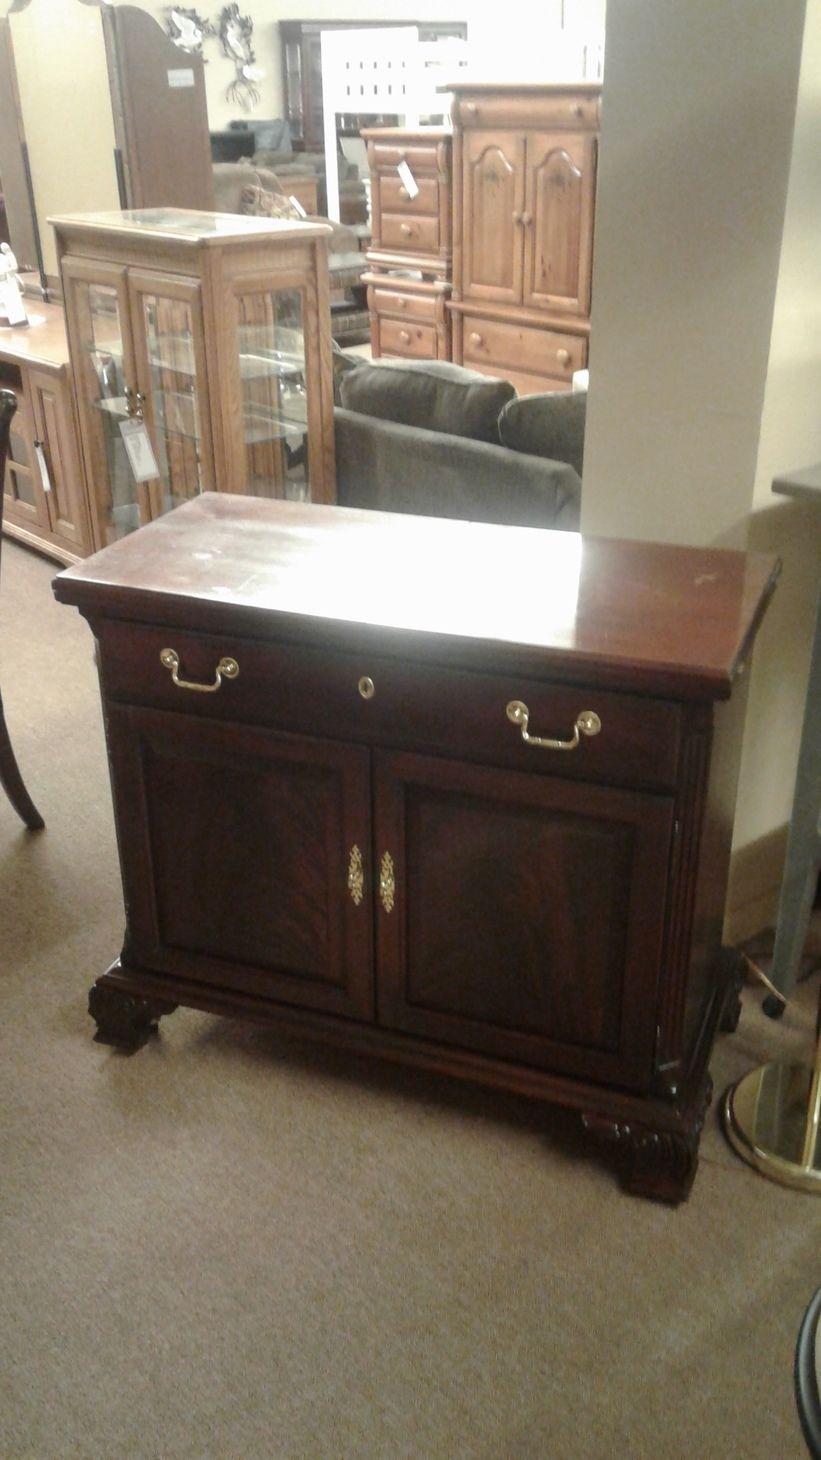 THOMASVILLE WET BAR Delmarva Furniture Consignment